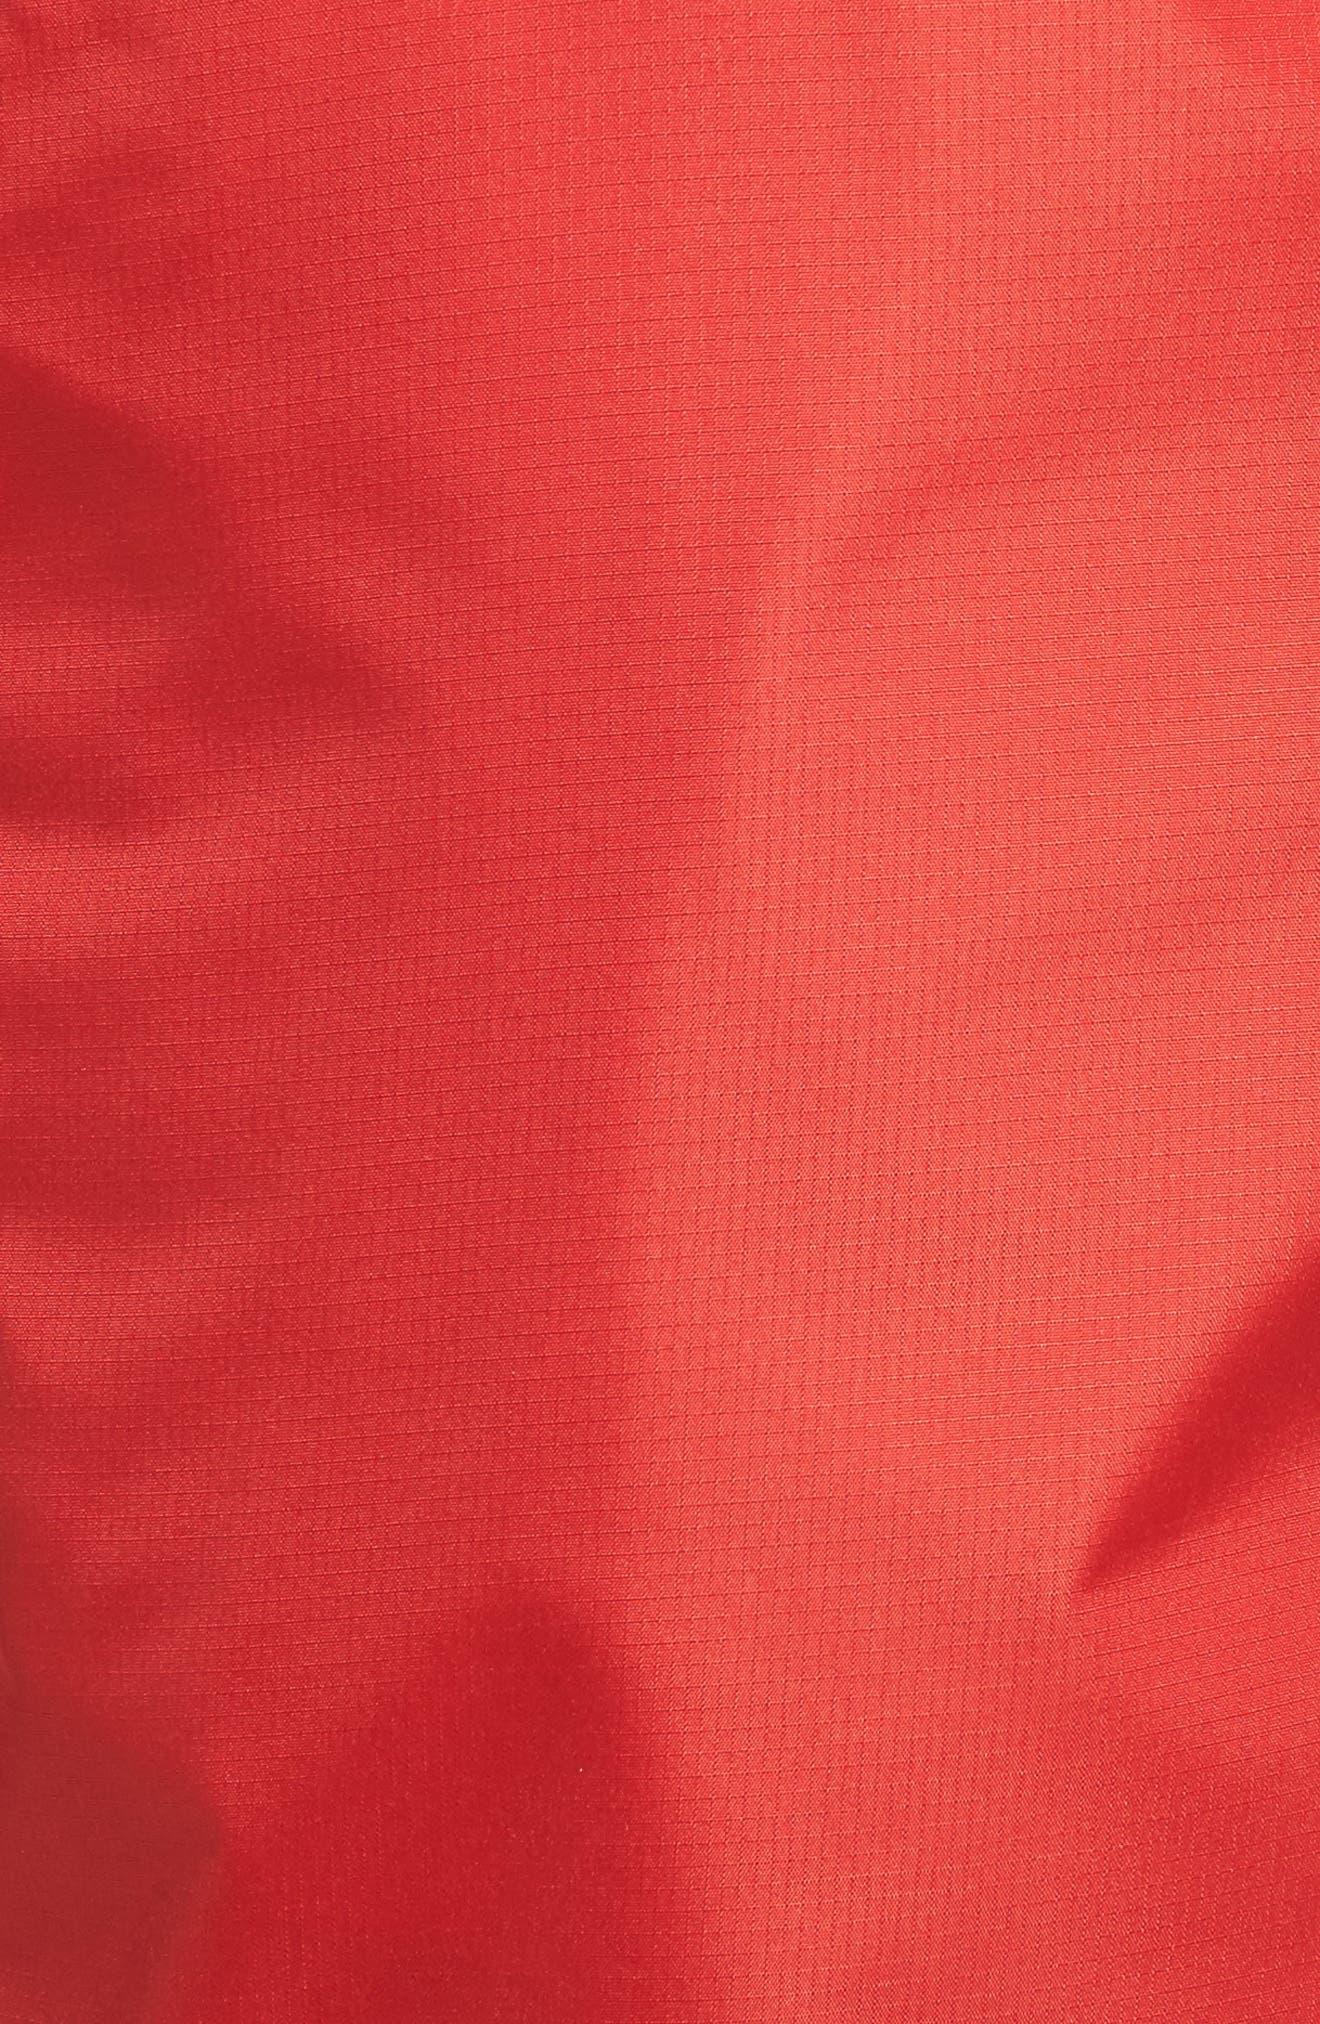 Boundless Board Shorts,                             Alternate thumbnail 15, color,